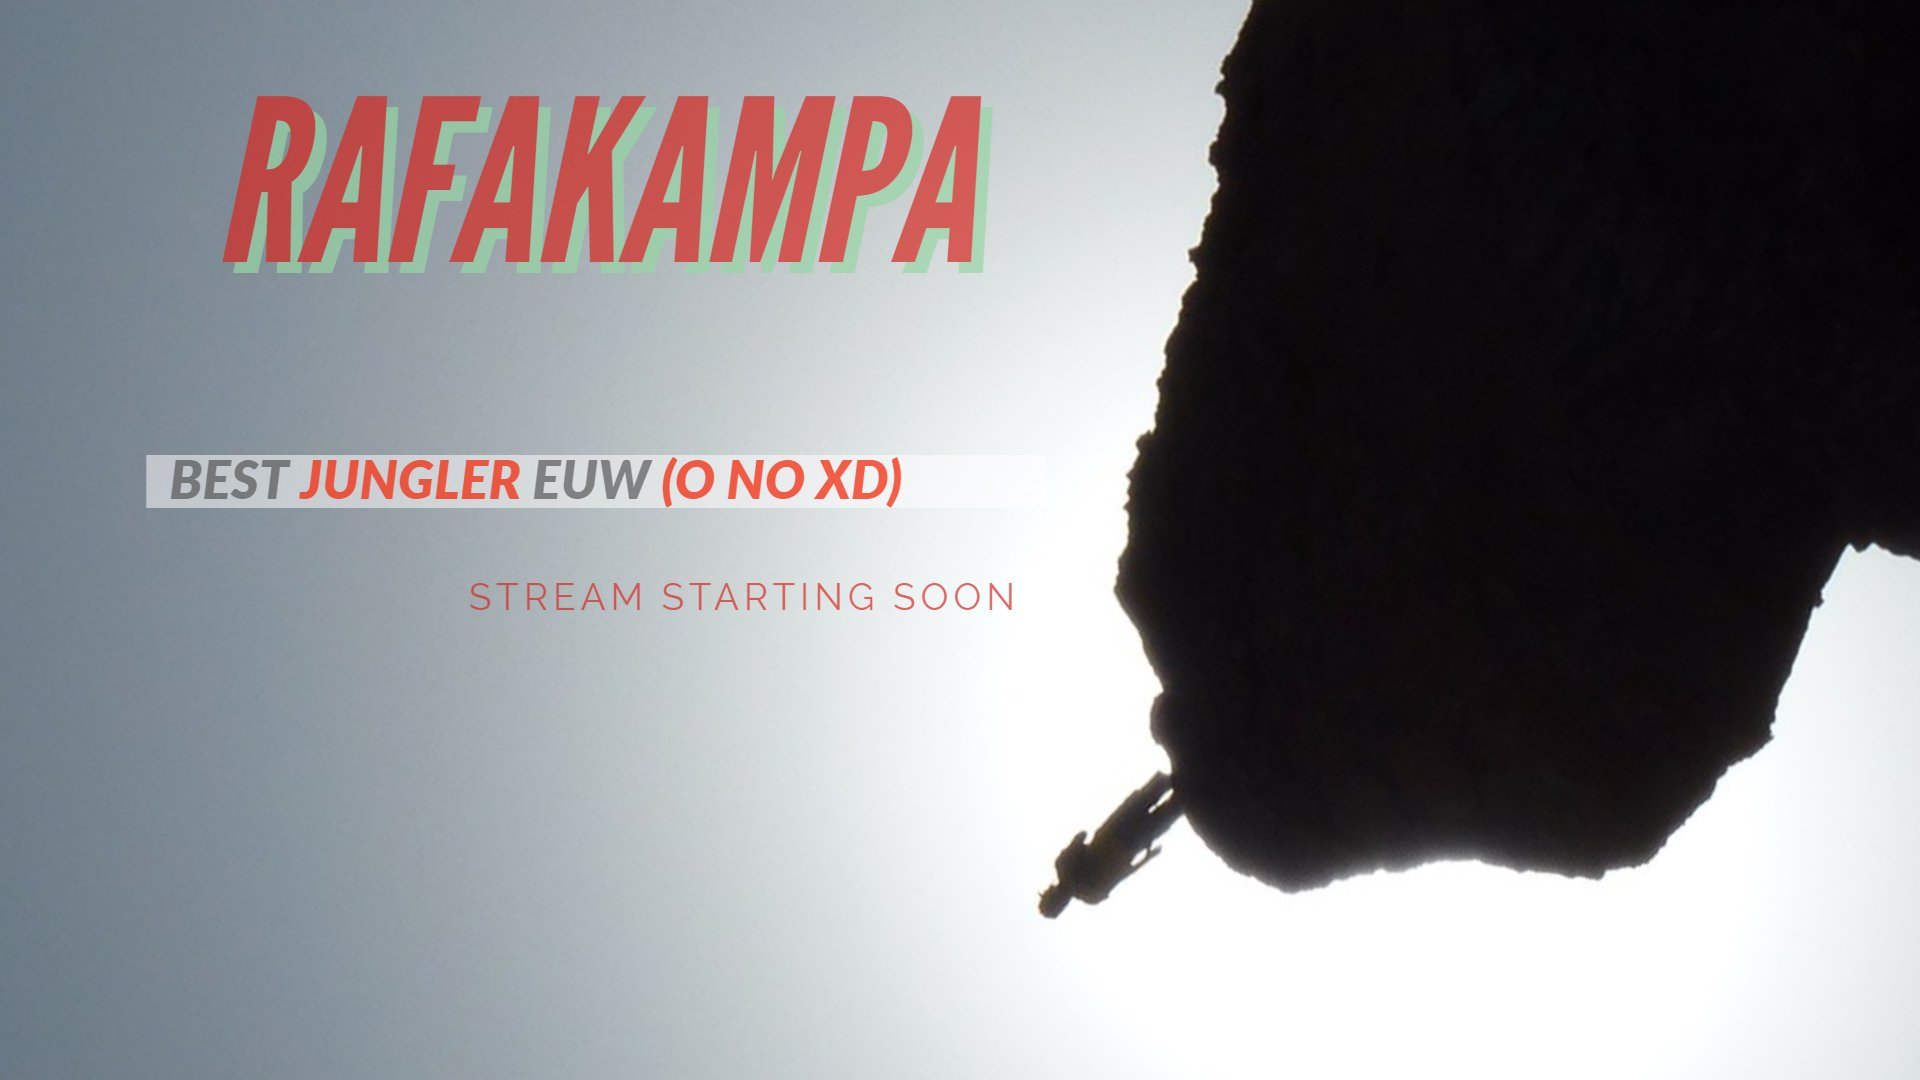 Rafakampa